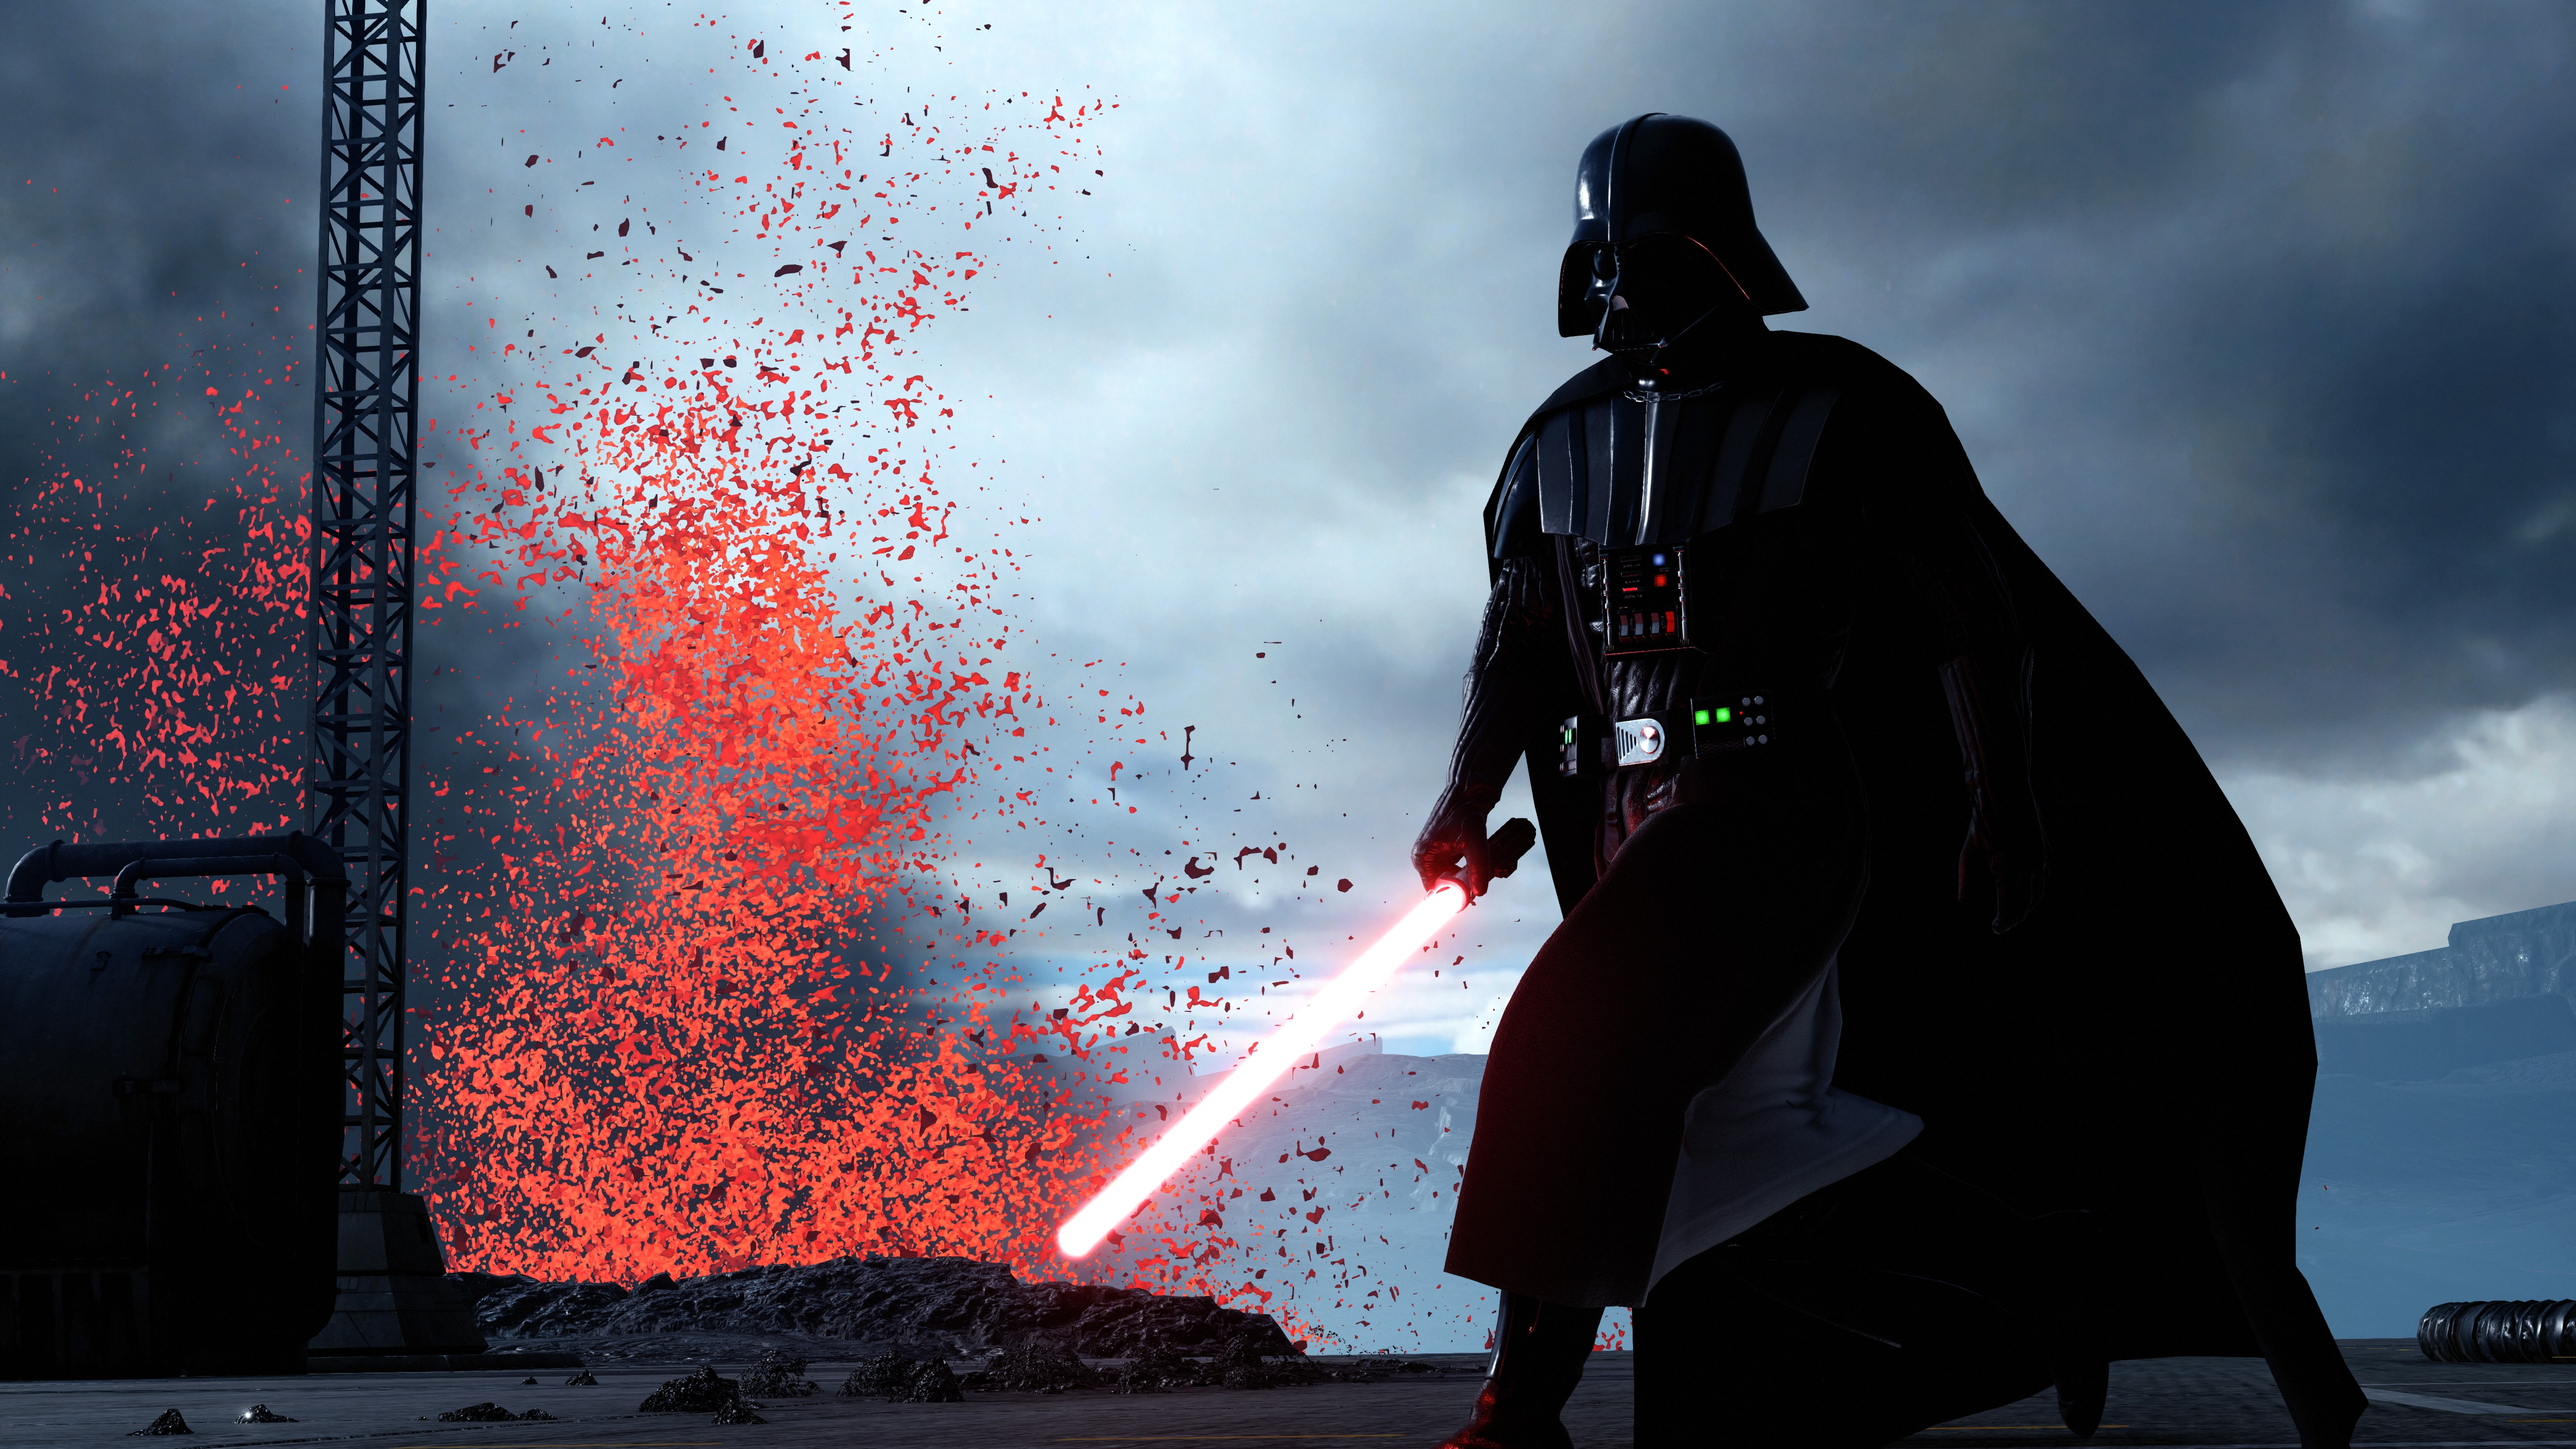 Darth Vader Desktop 4k Wallpapers Wallpaper Cave